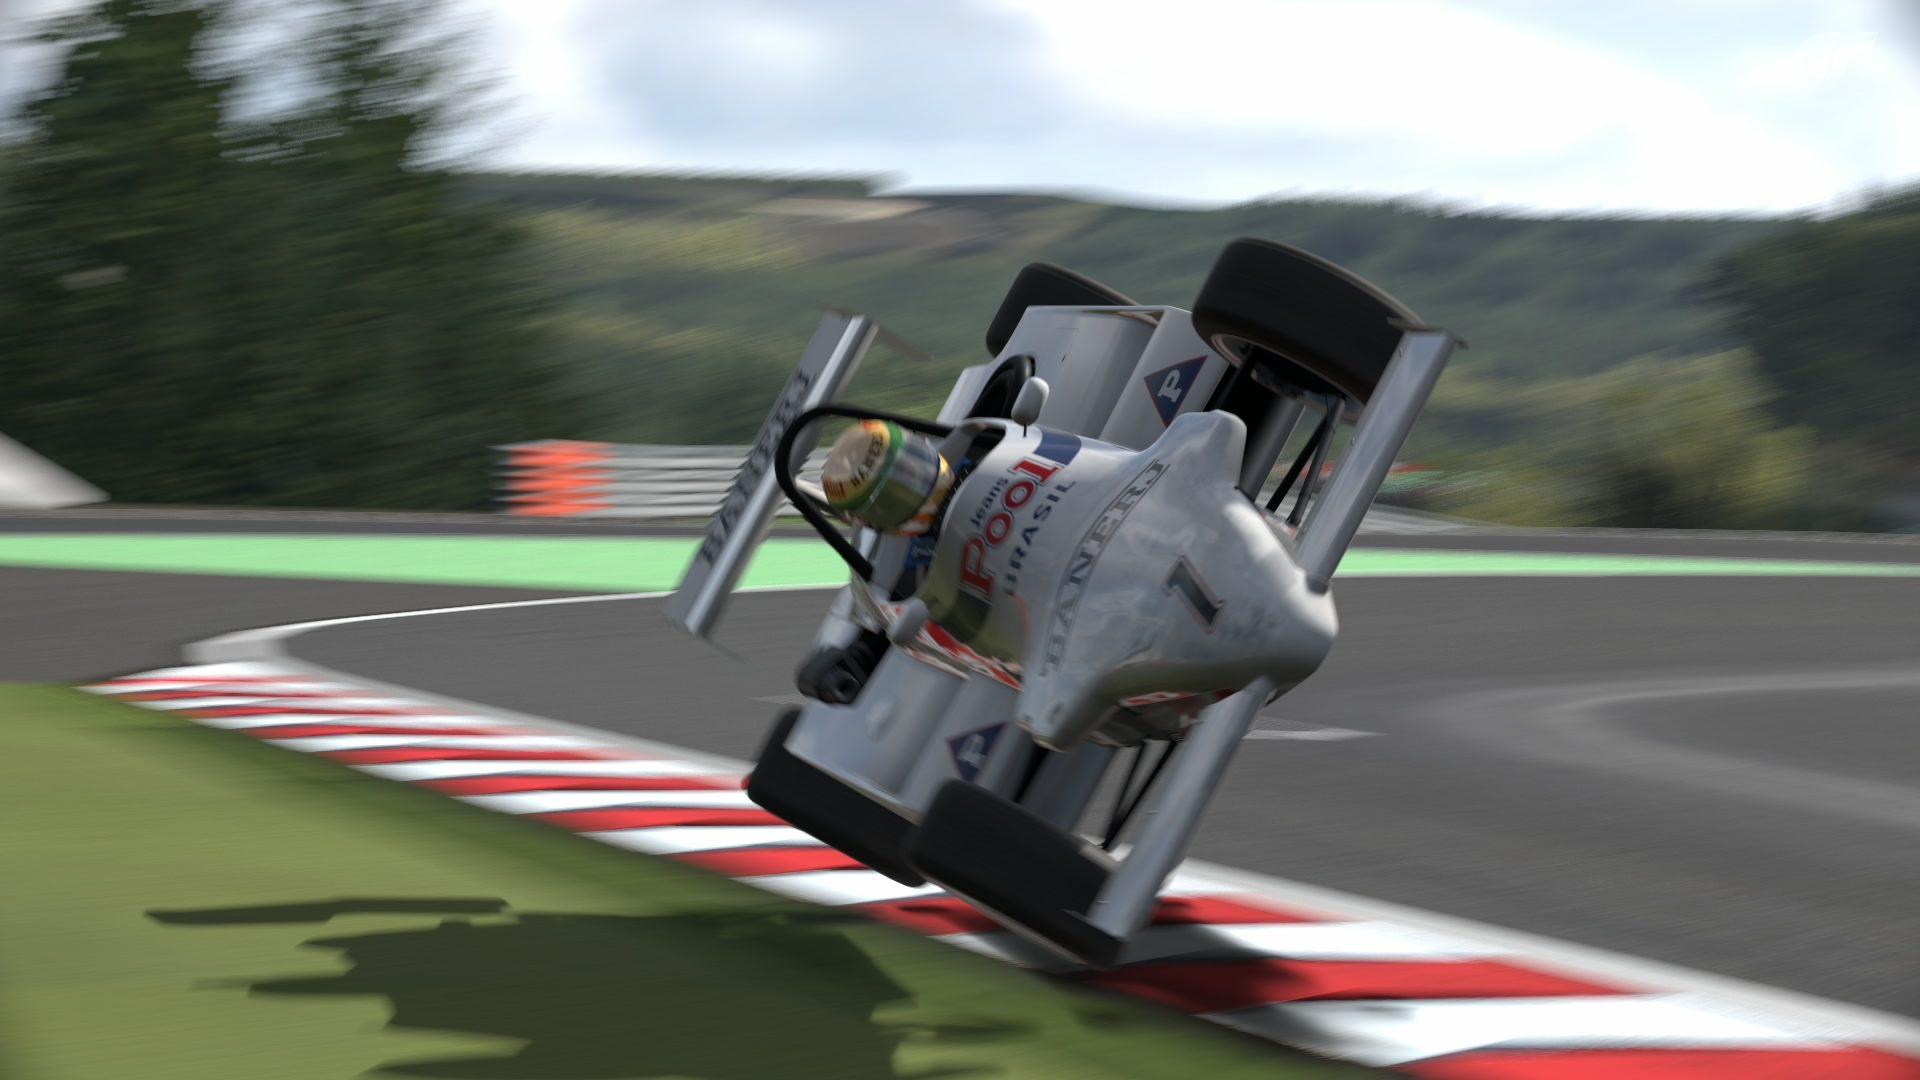 Circuit de Spa-Francorchamps_6 (5).jpg